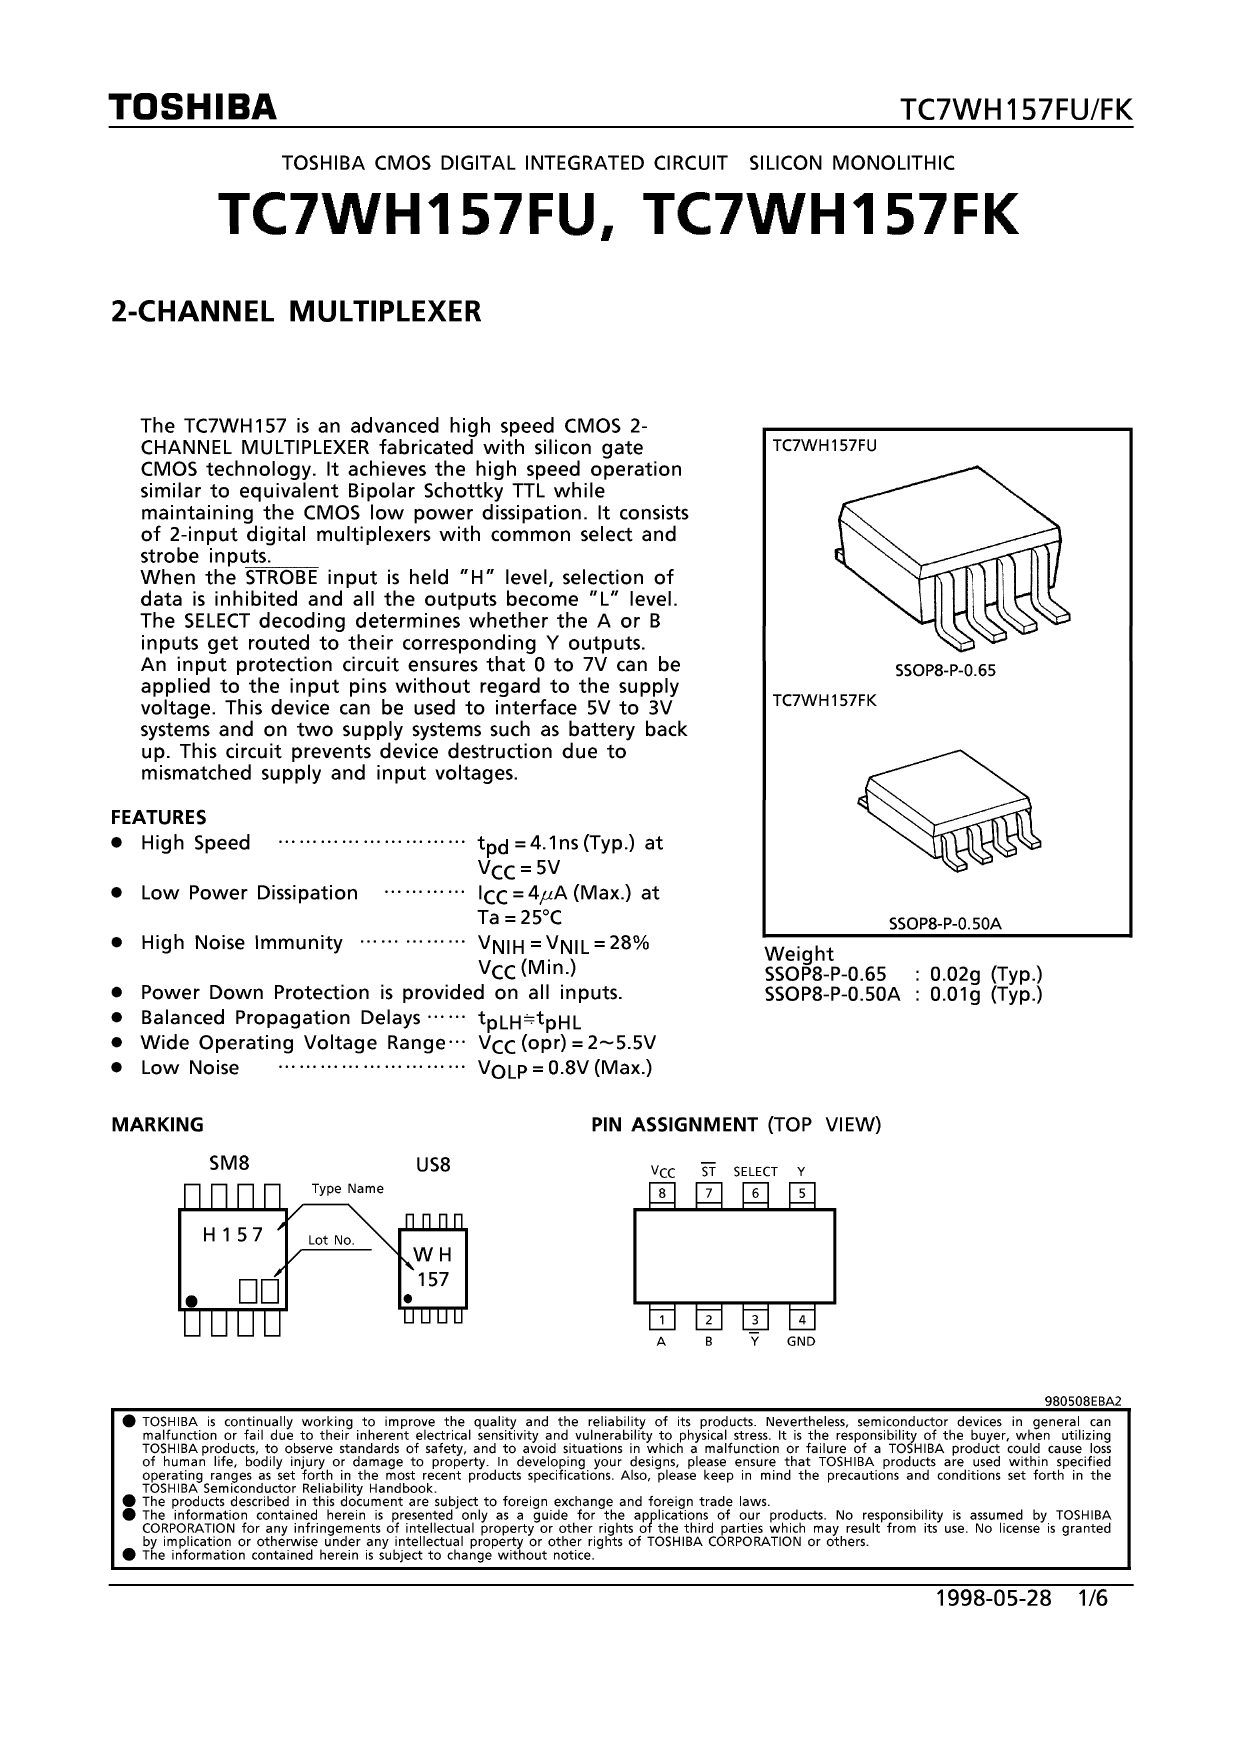 TC7WH157FK دیتاشیت PDF